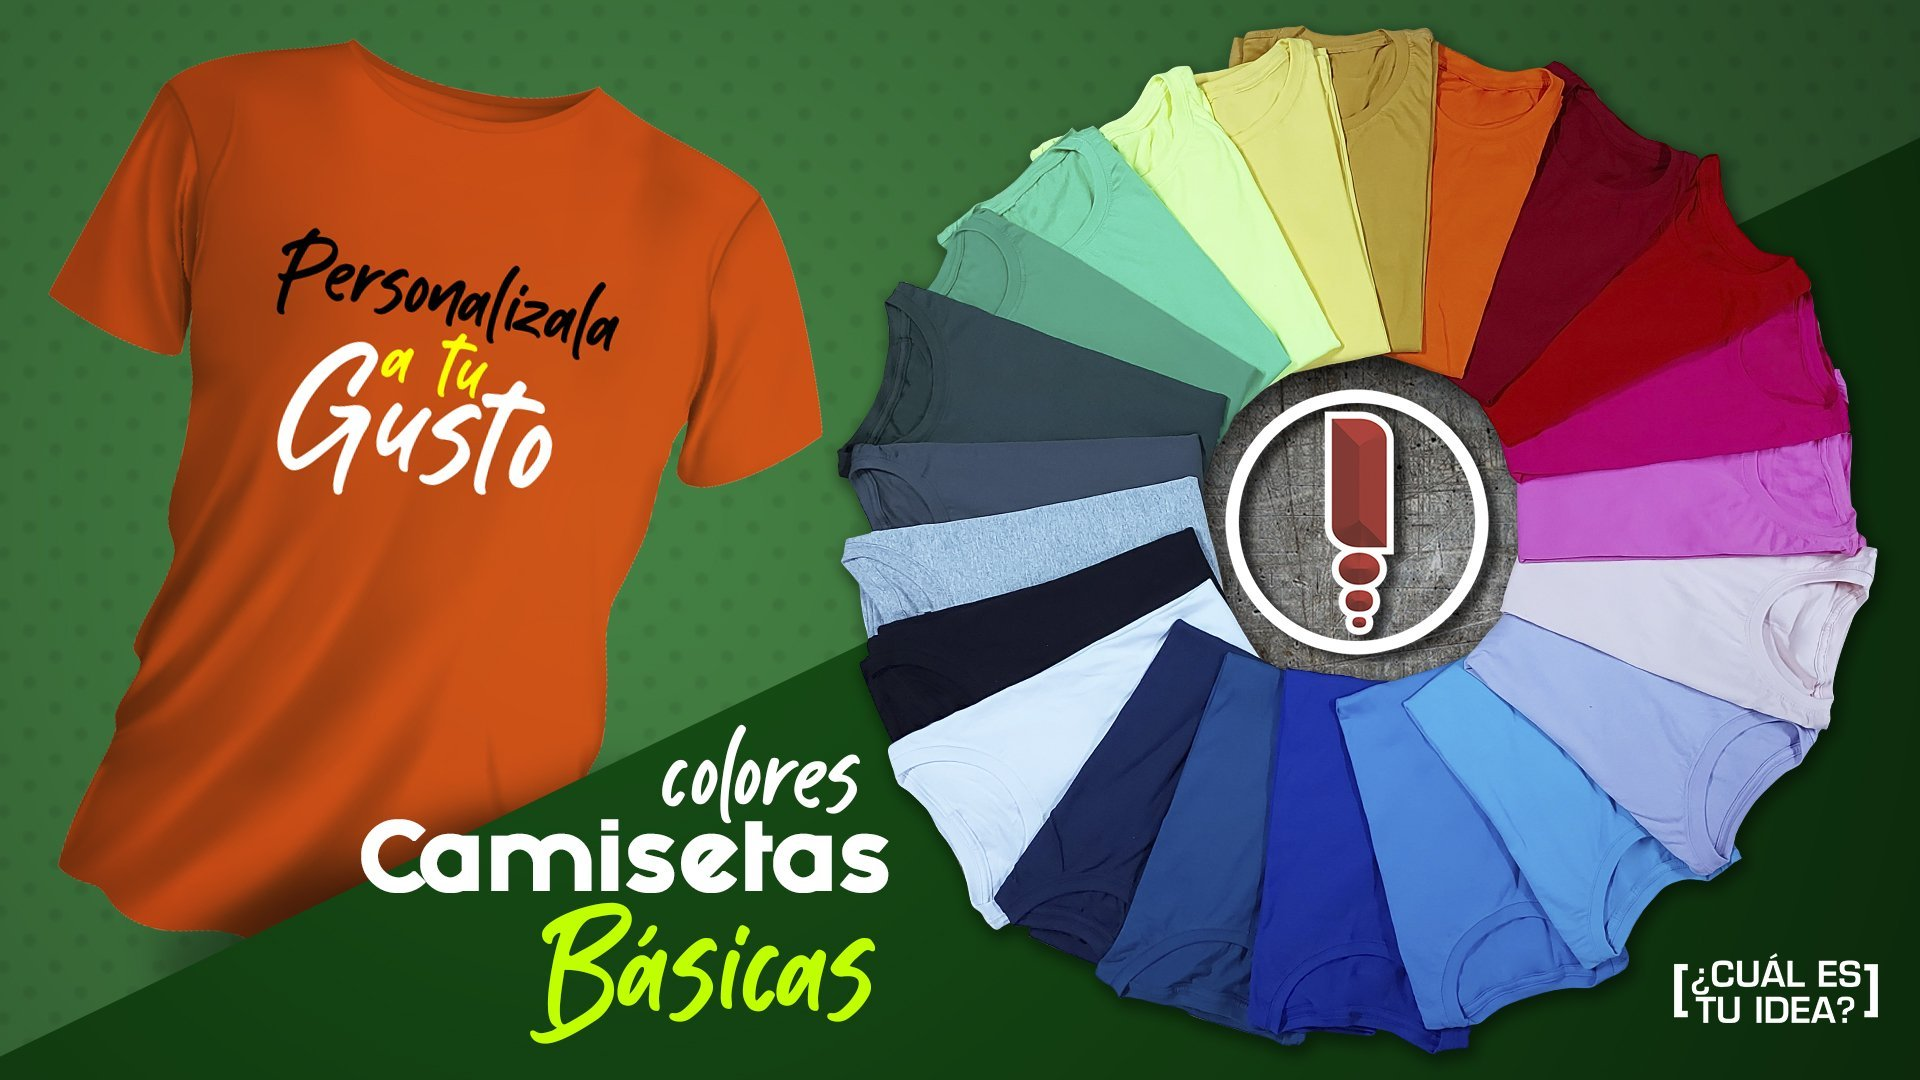 Camisetas-Ibiza-Centro-Comercial-La-Central